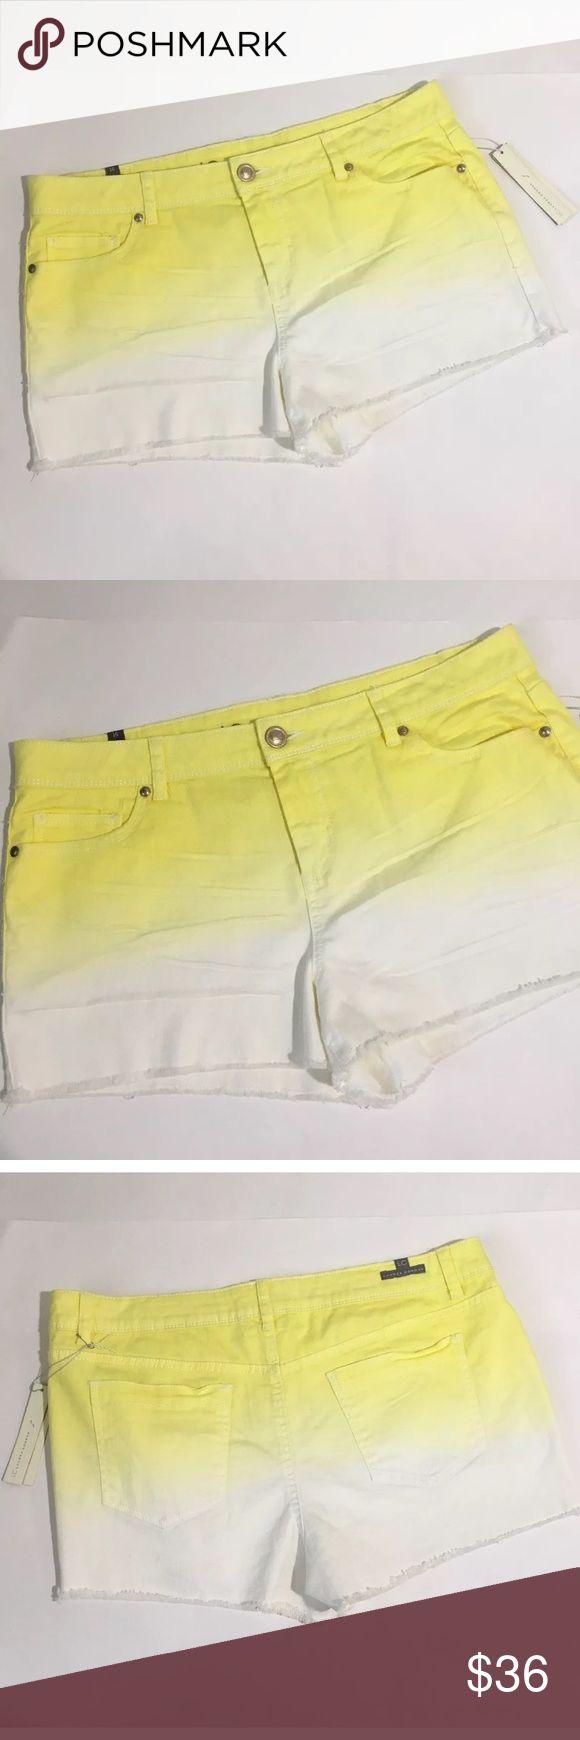 "NWT Lauren Conrad Yellow White Cutoff Jean Shorts New with tags Lauren Conrad yellow and white cutoff jean shorts. Size 16. Measurements 18"" waist laying flat, 12"" waist to hem. LC Lauren Conrad Shorts Jean Shorts"